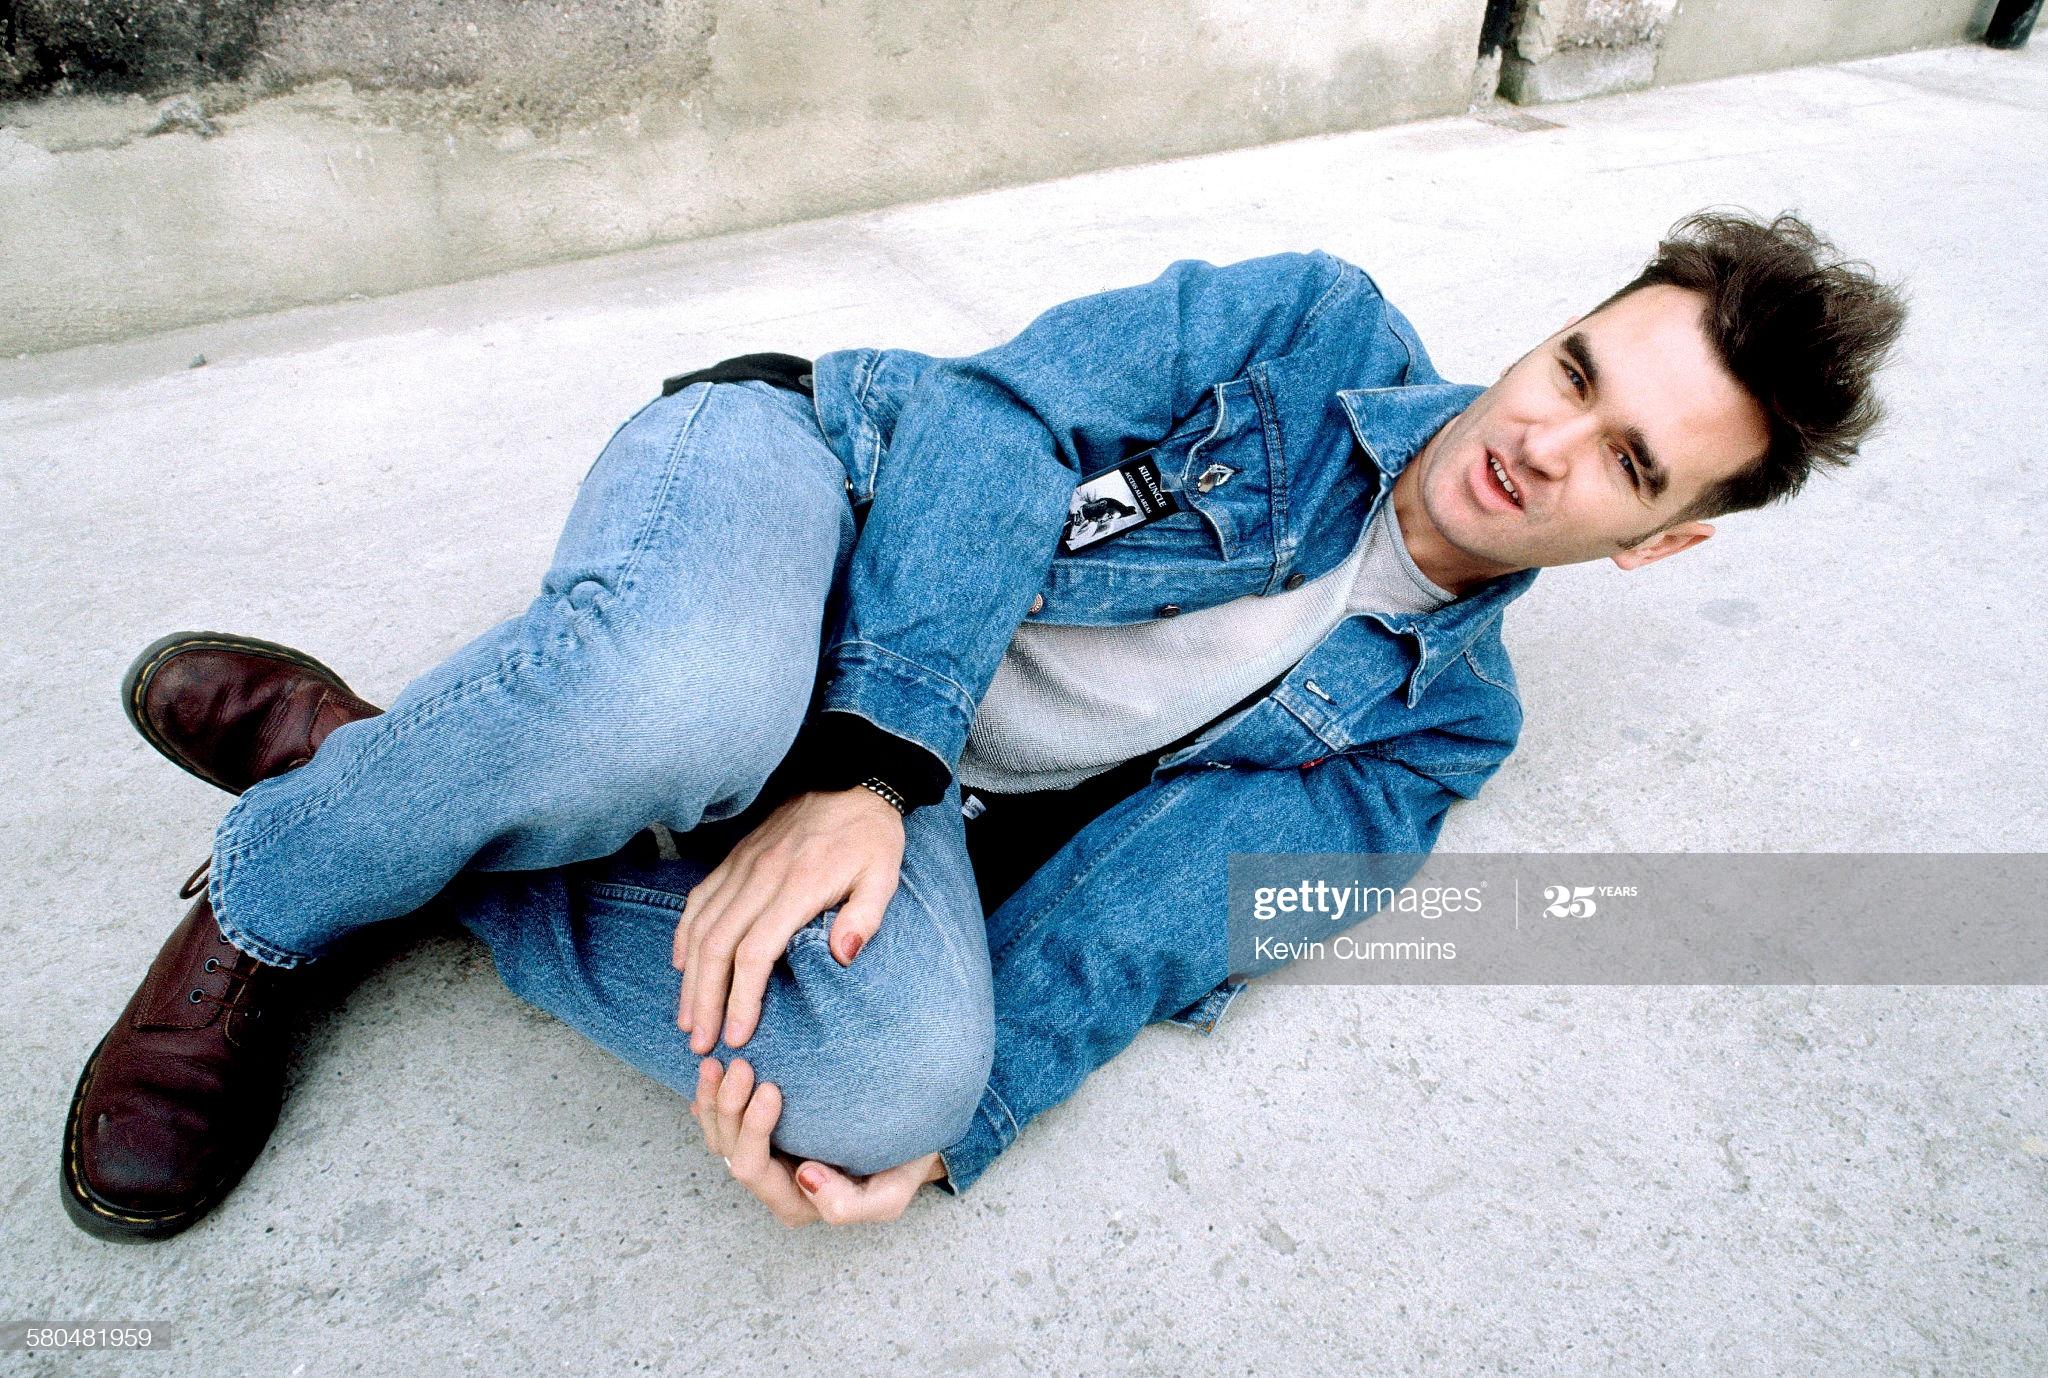 Morrissey ~ Dublin 27th April 1991 (i) Kevin Cummins.jpg